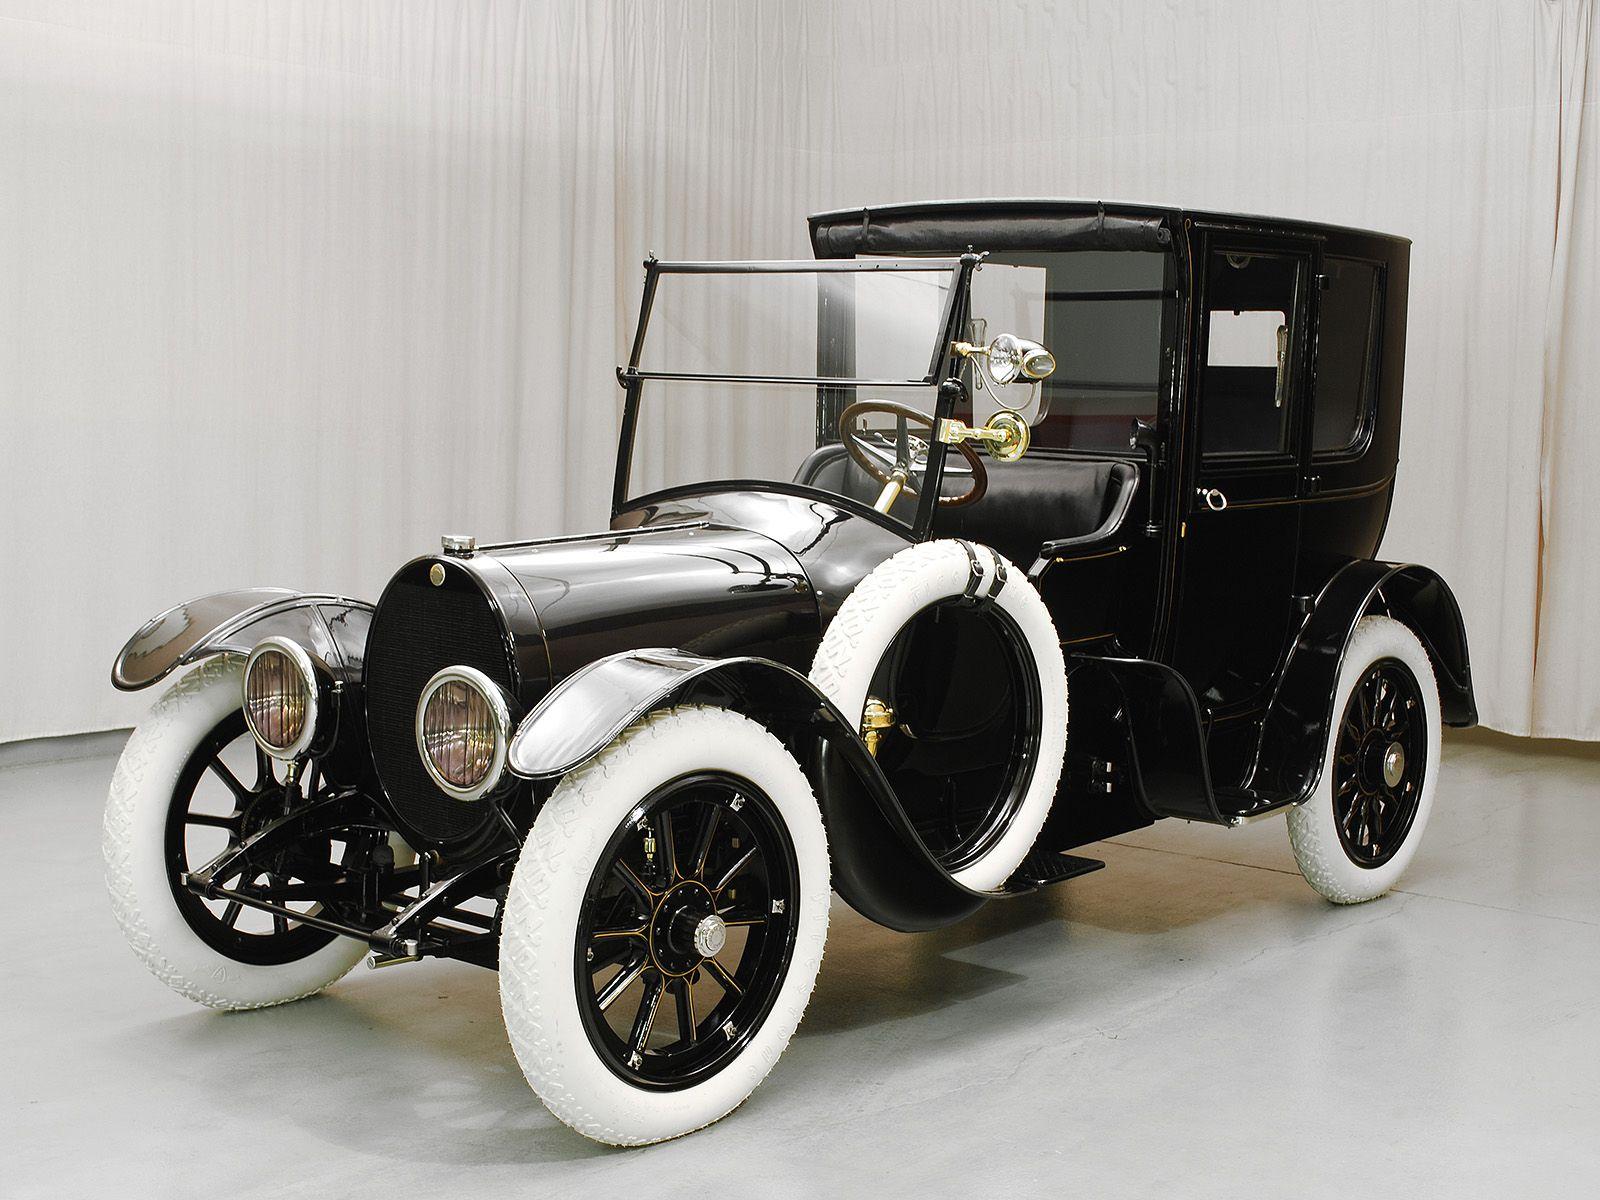 1915 Brewster Town Car – Hyman Ltd. Classic Cars